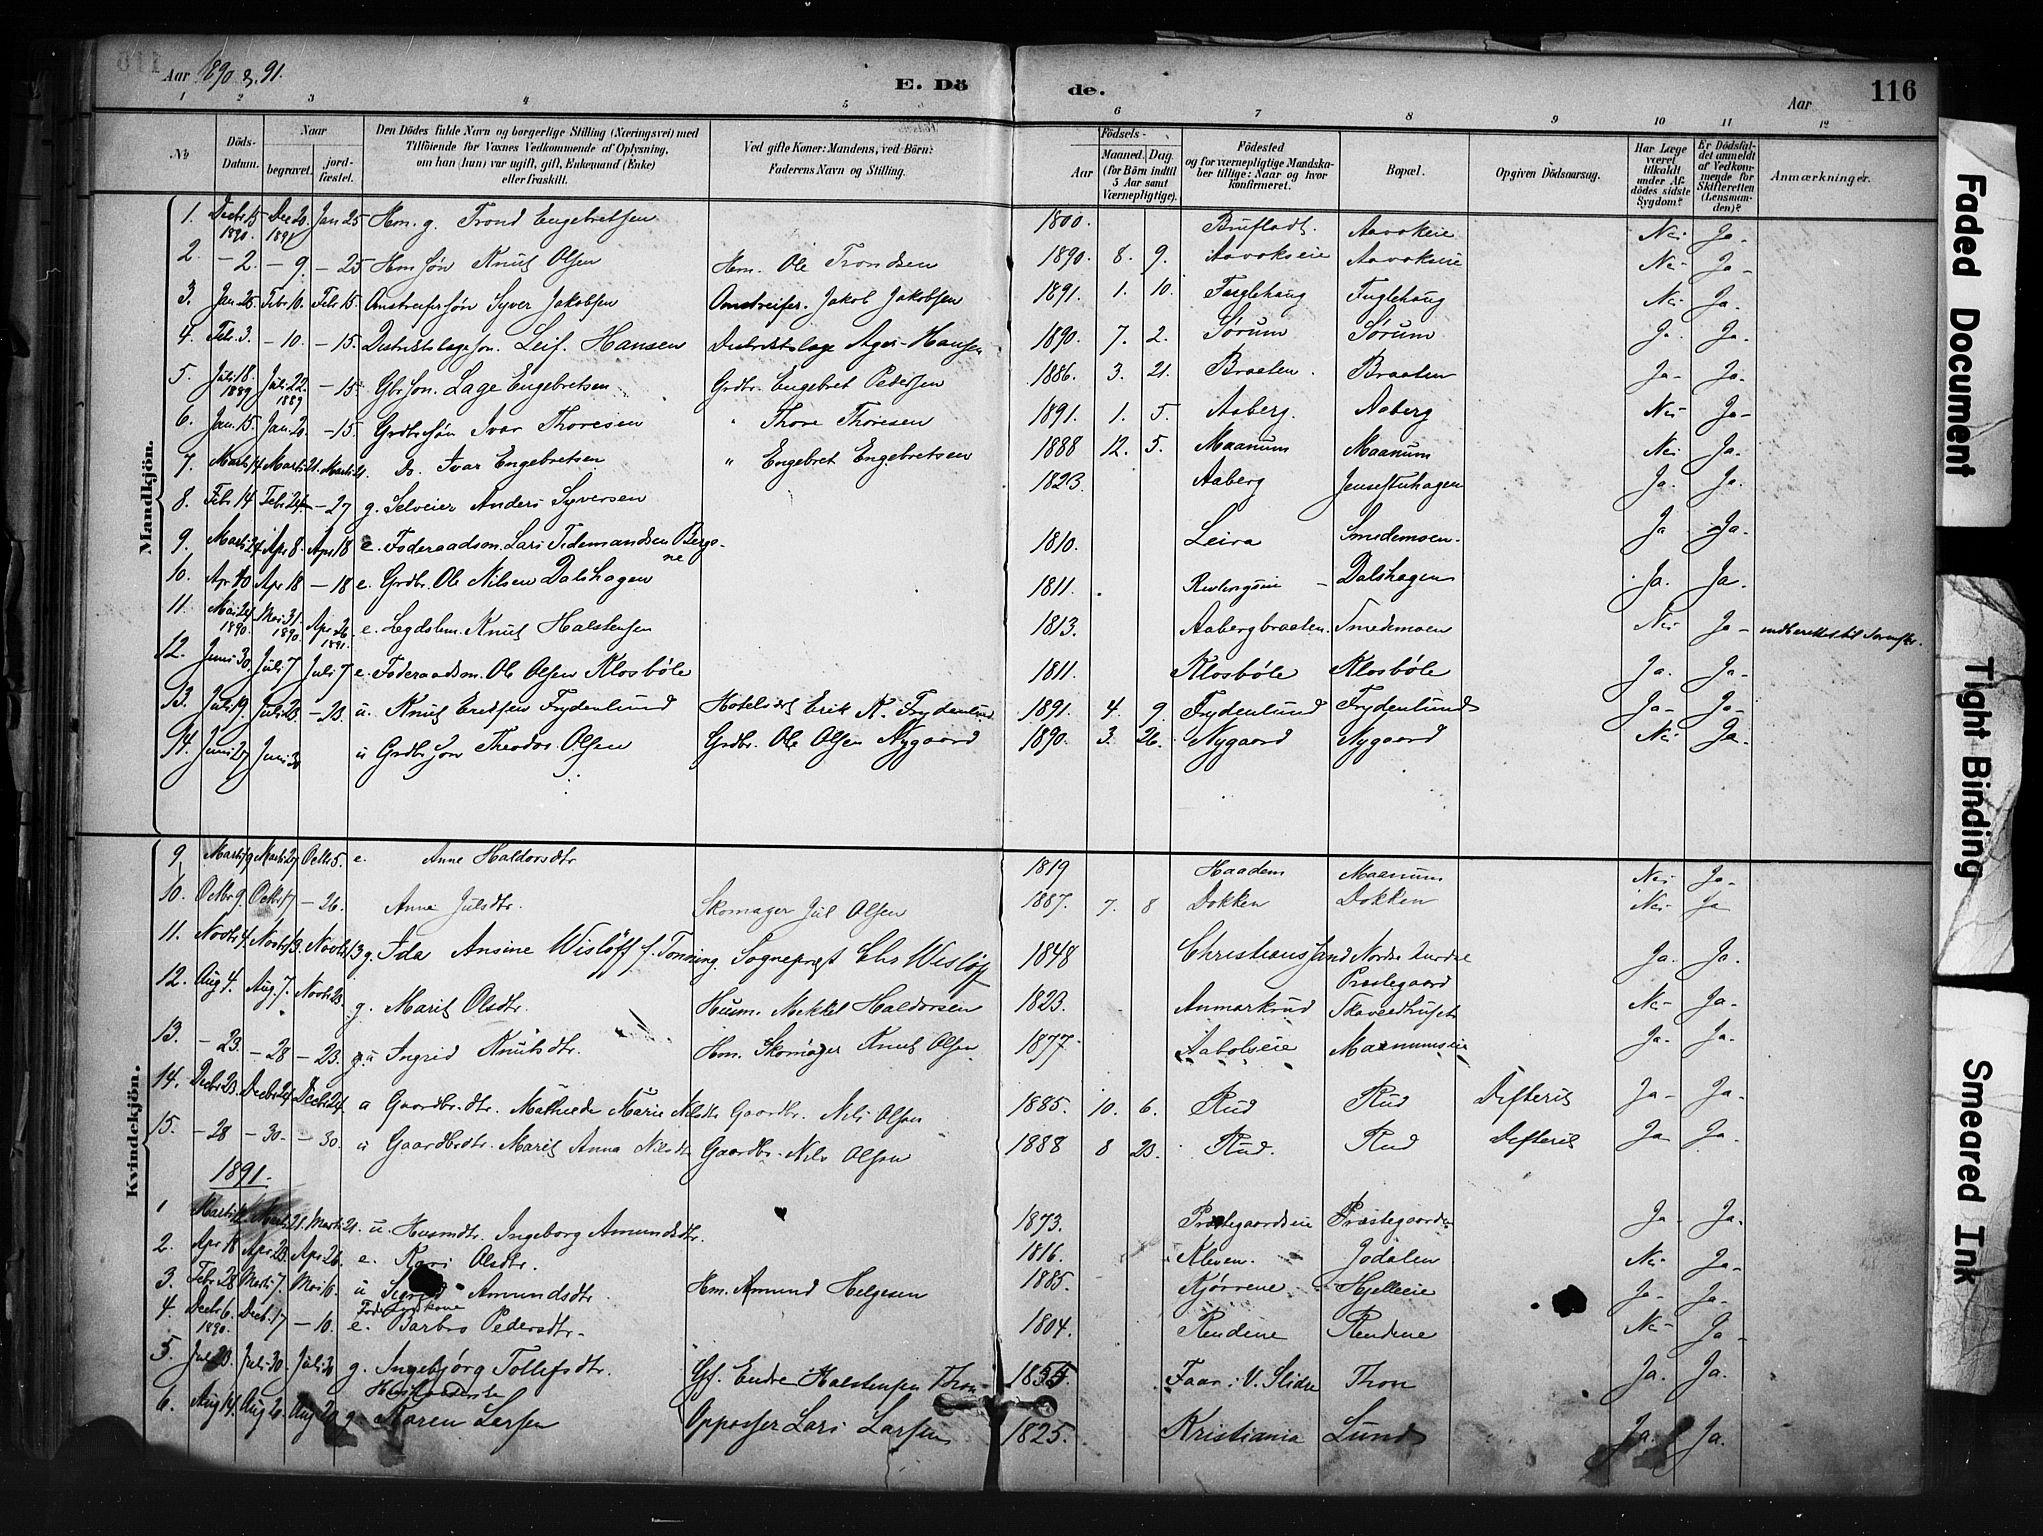 SAH, Nord-Aurdal prestekontor, Ministerialbok nr. 13, 1883-1895, s. 116